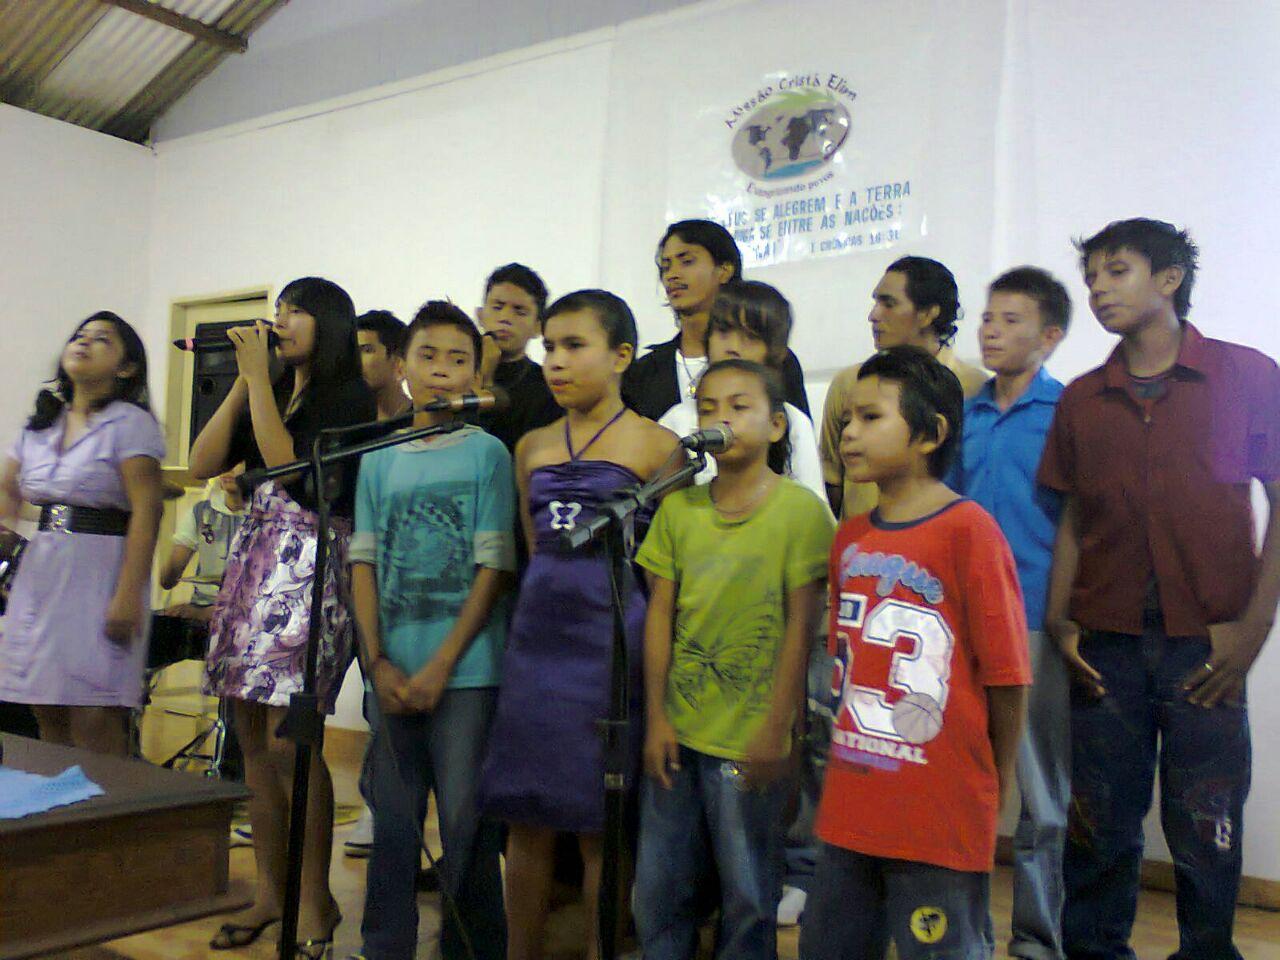 Culto na MCE Silves, em Silves/AM